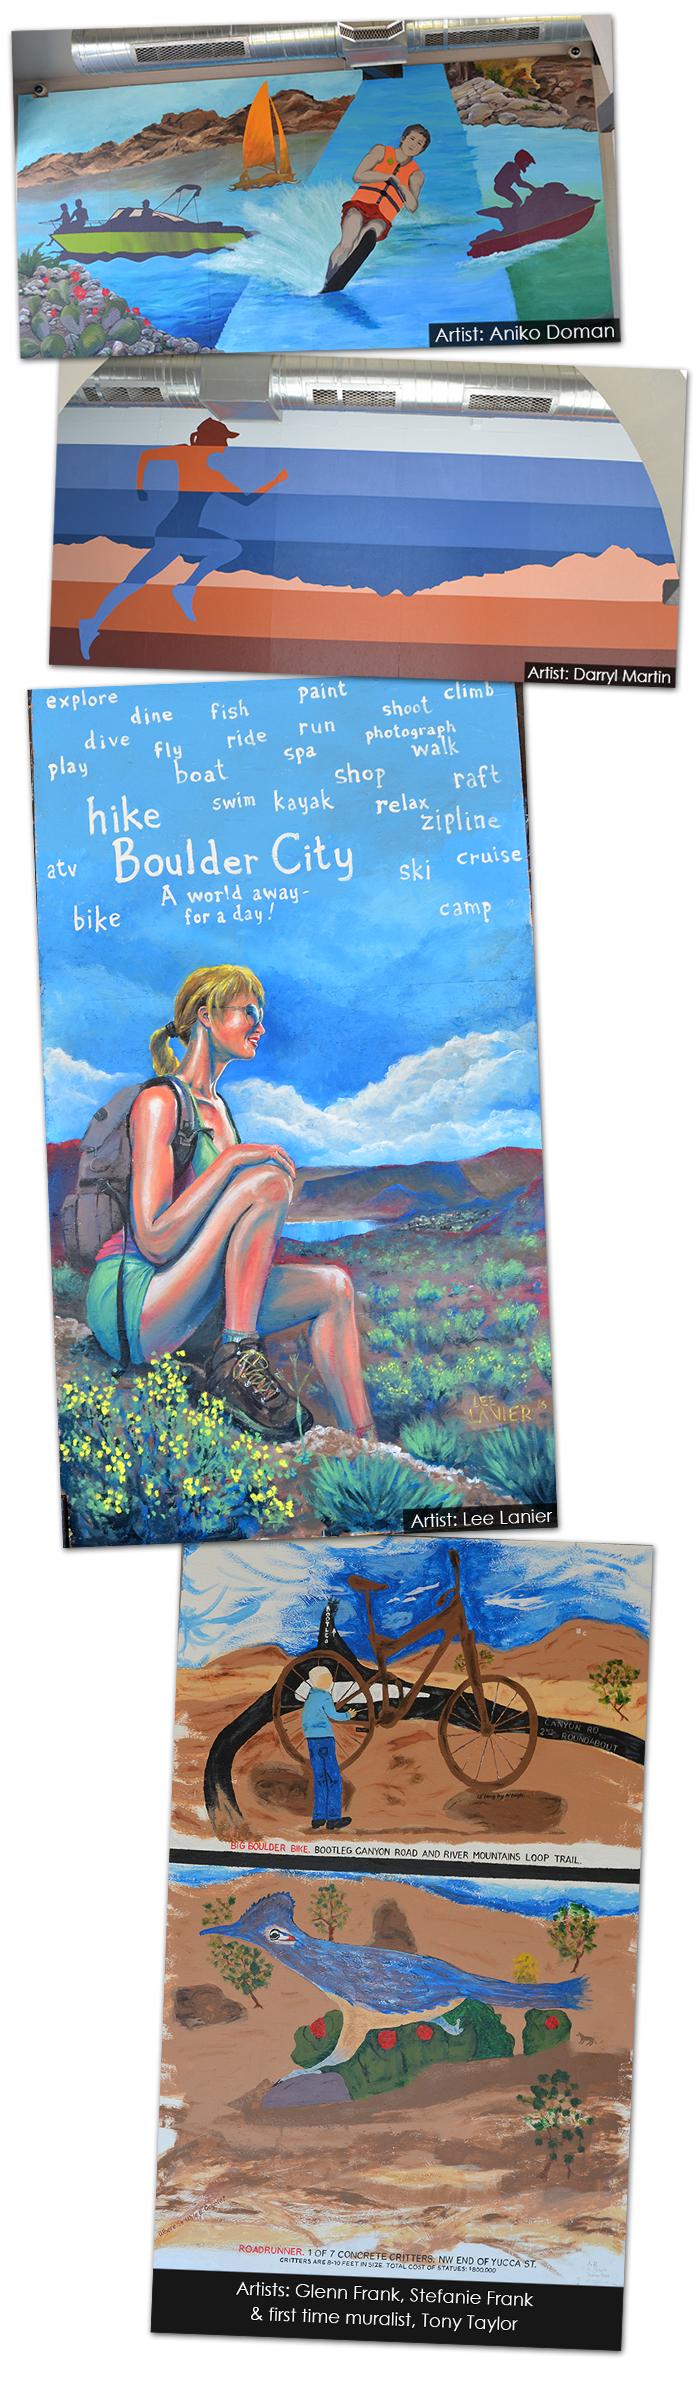 Scratch House Murals in Boulder City, Nevada